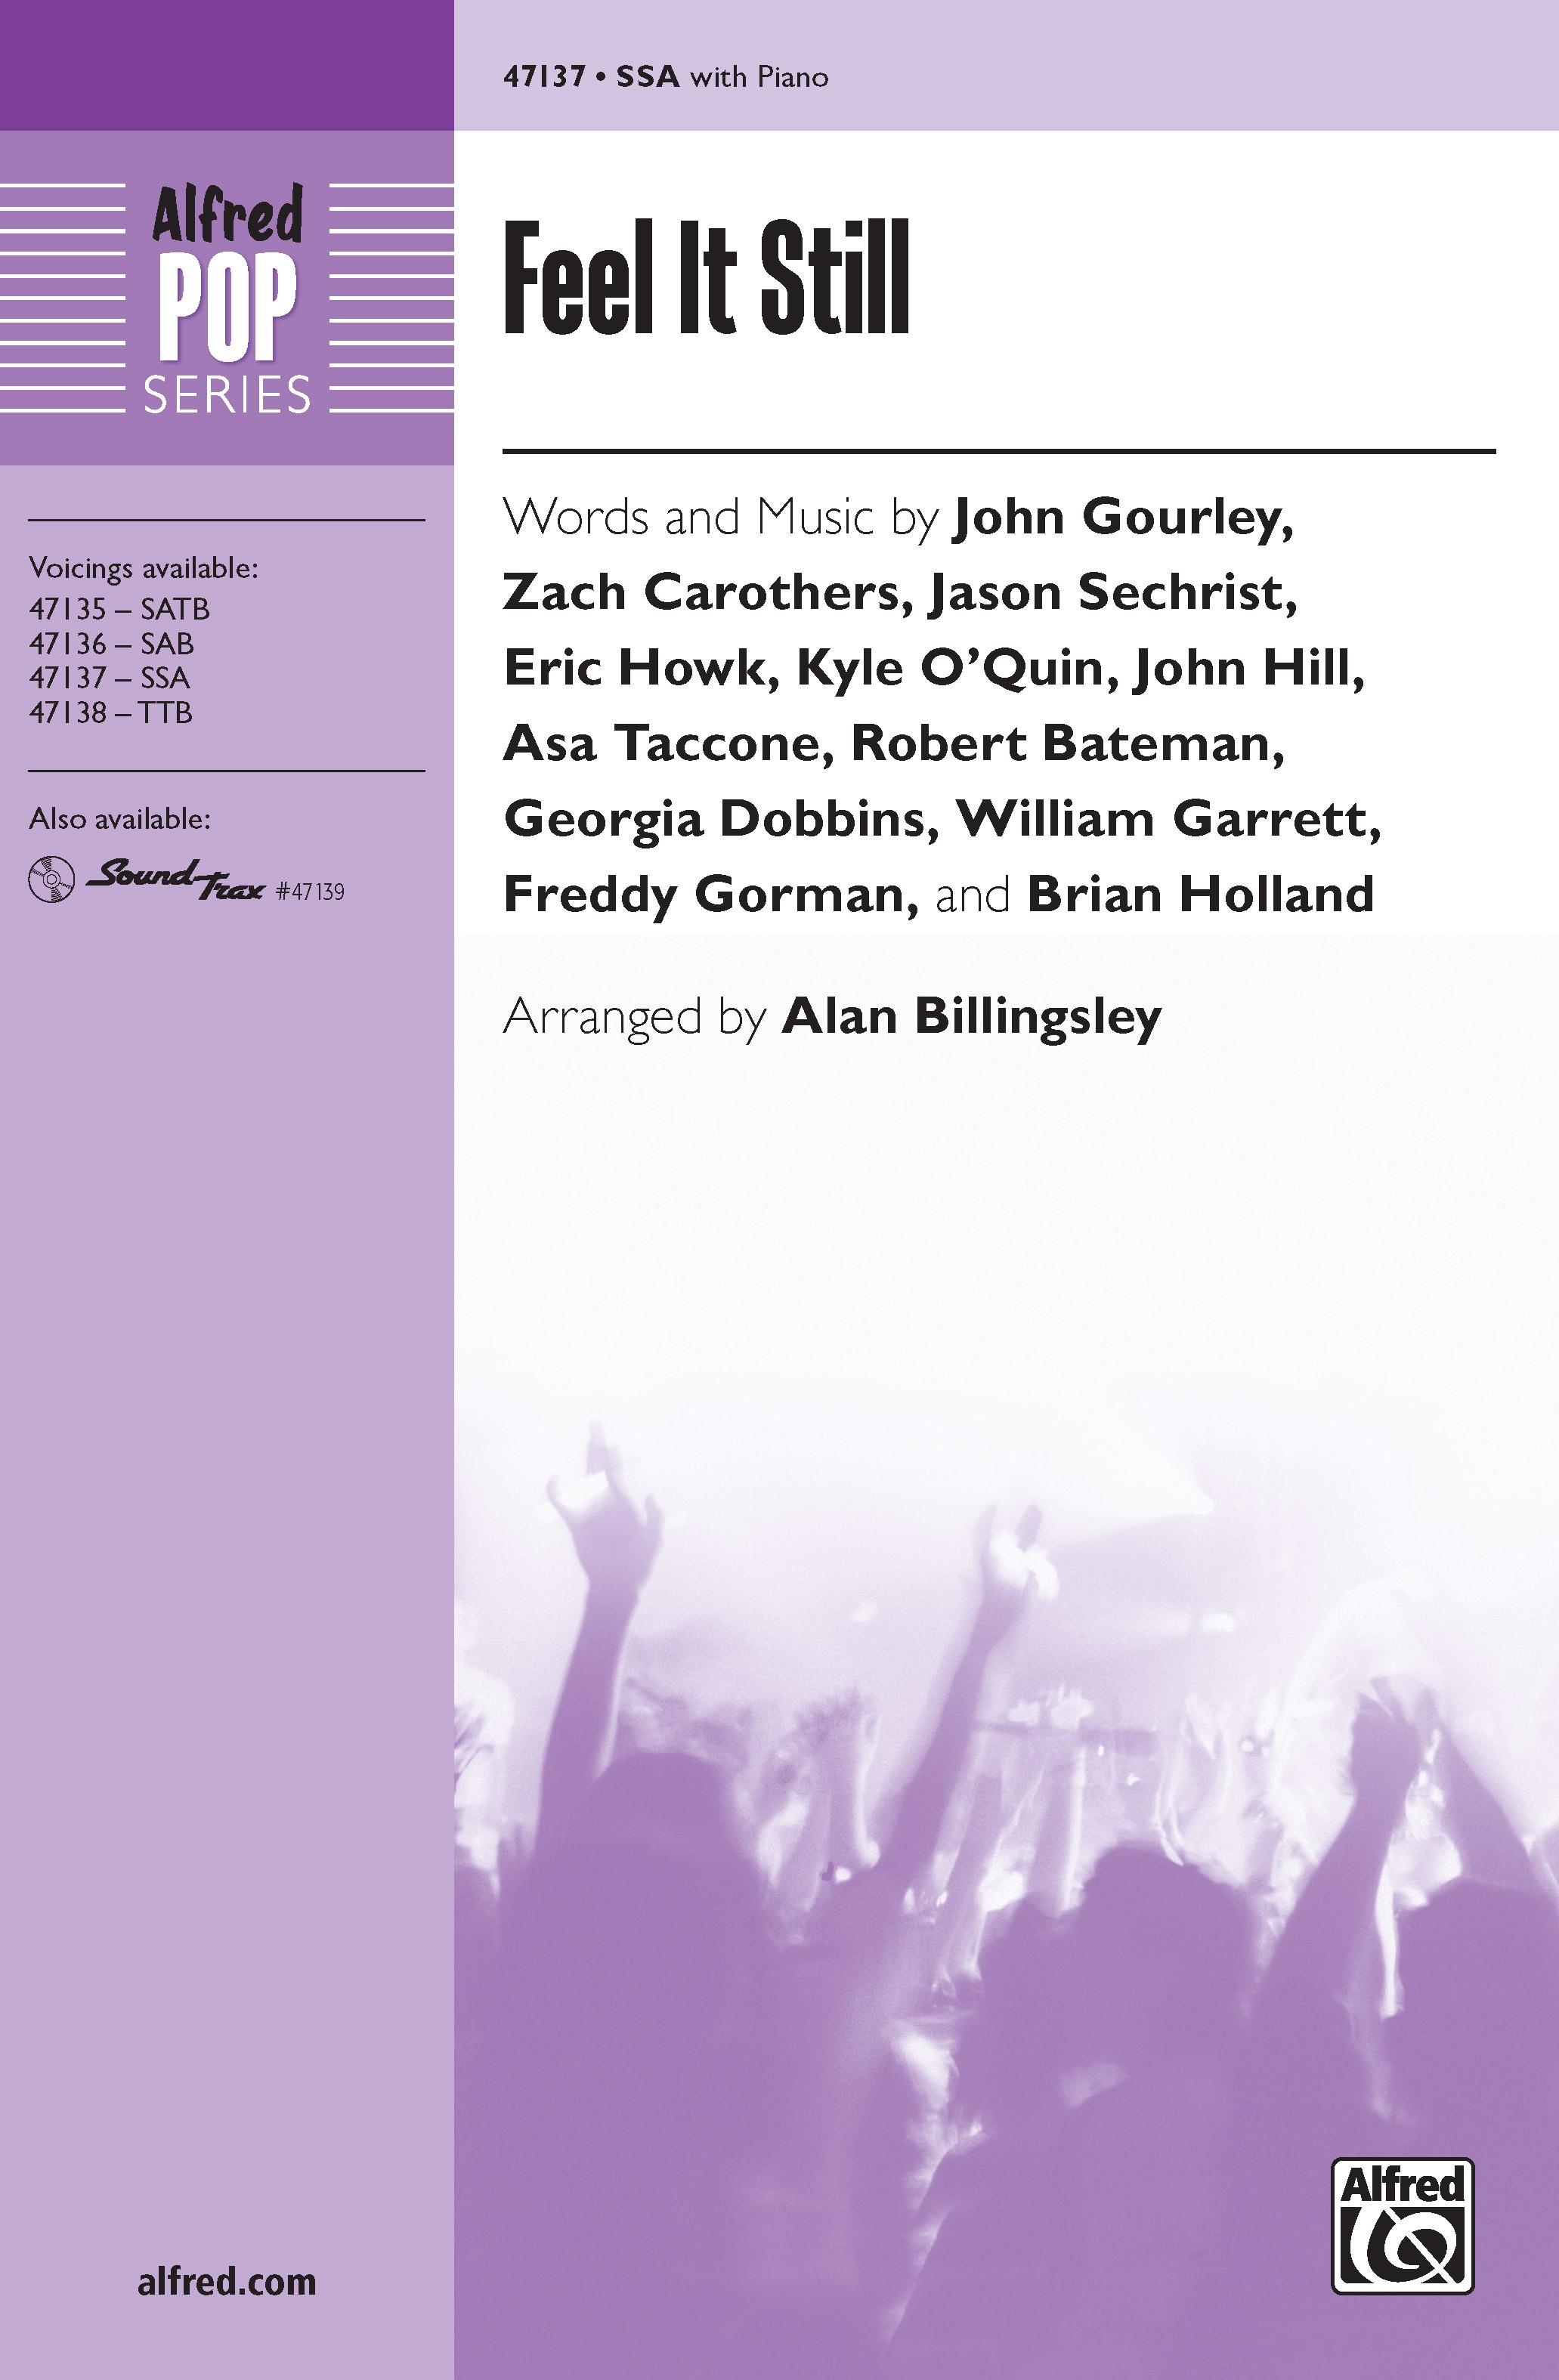 Feel It Still : SSA : Alan Billingsley : John Gourley : Sheet Music : 00-47137 : 038081539089